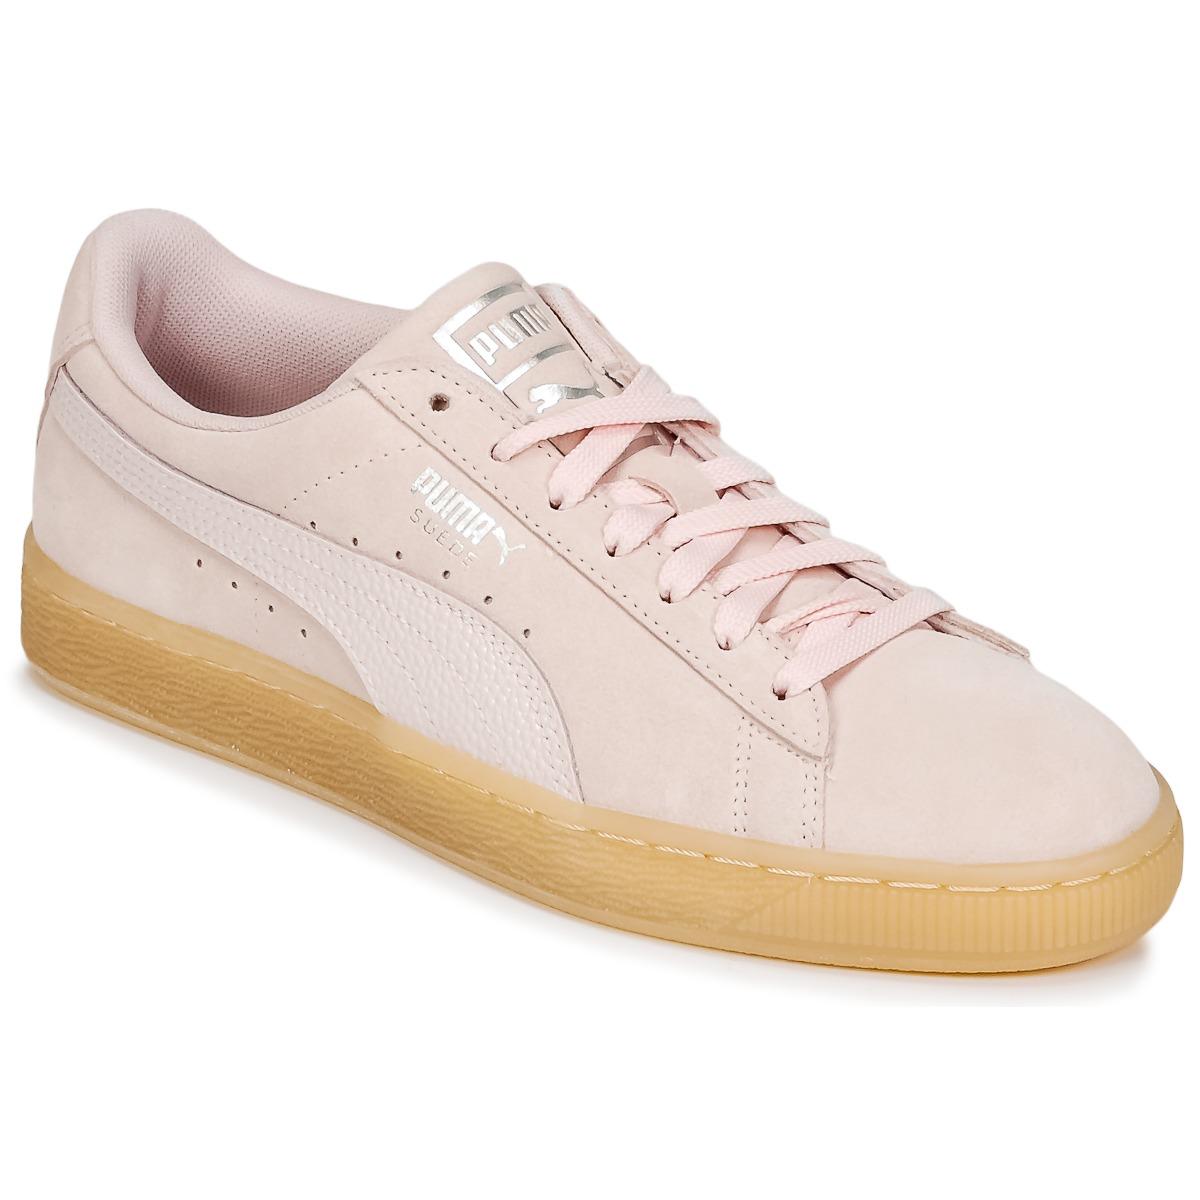 Puma SUEDE CLASSIC BUBBLE W'S Rose - Kostenloser Versand bei Spartoode ! - Schuhe Sneaker Low Damen 49,50 €